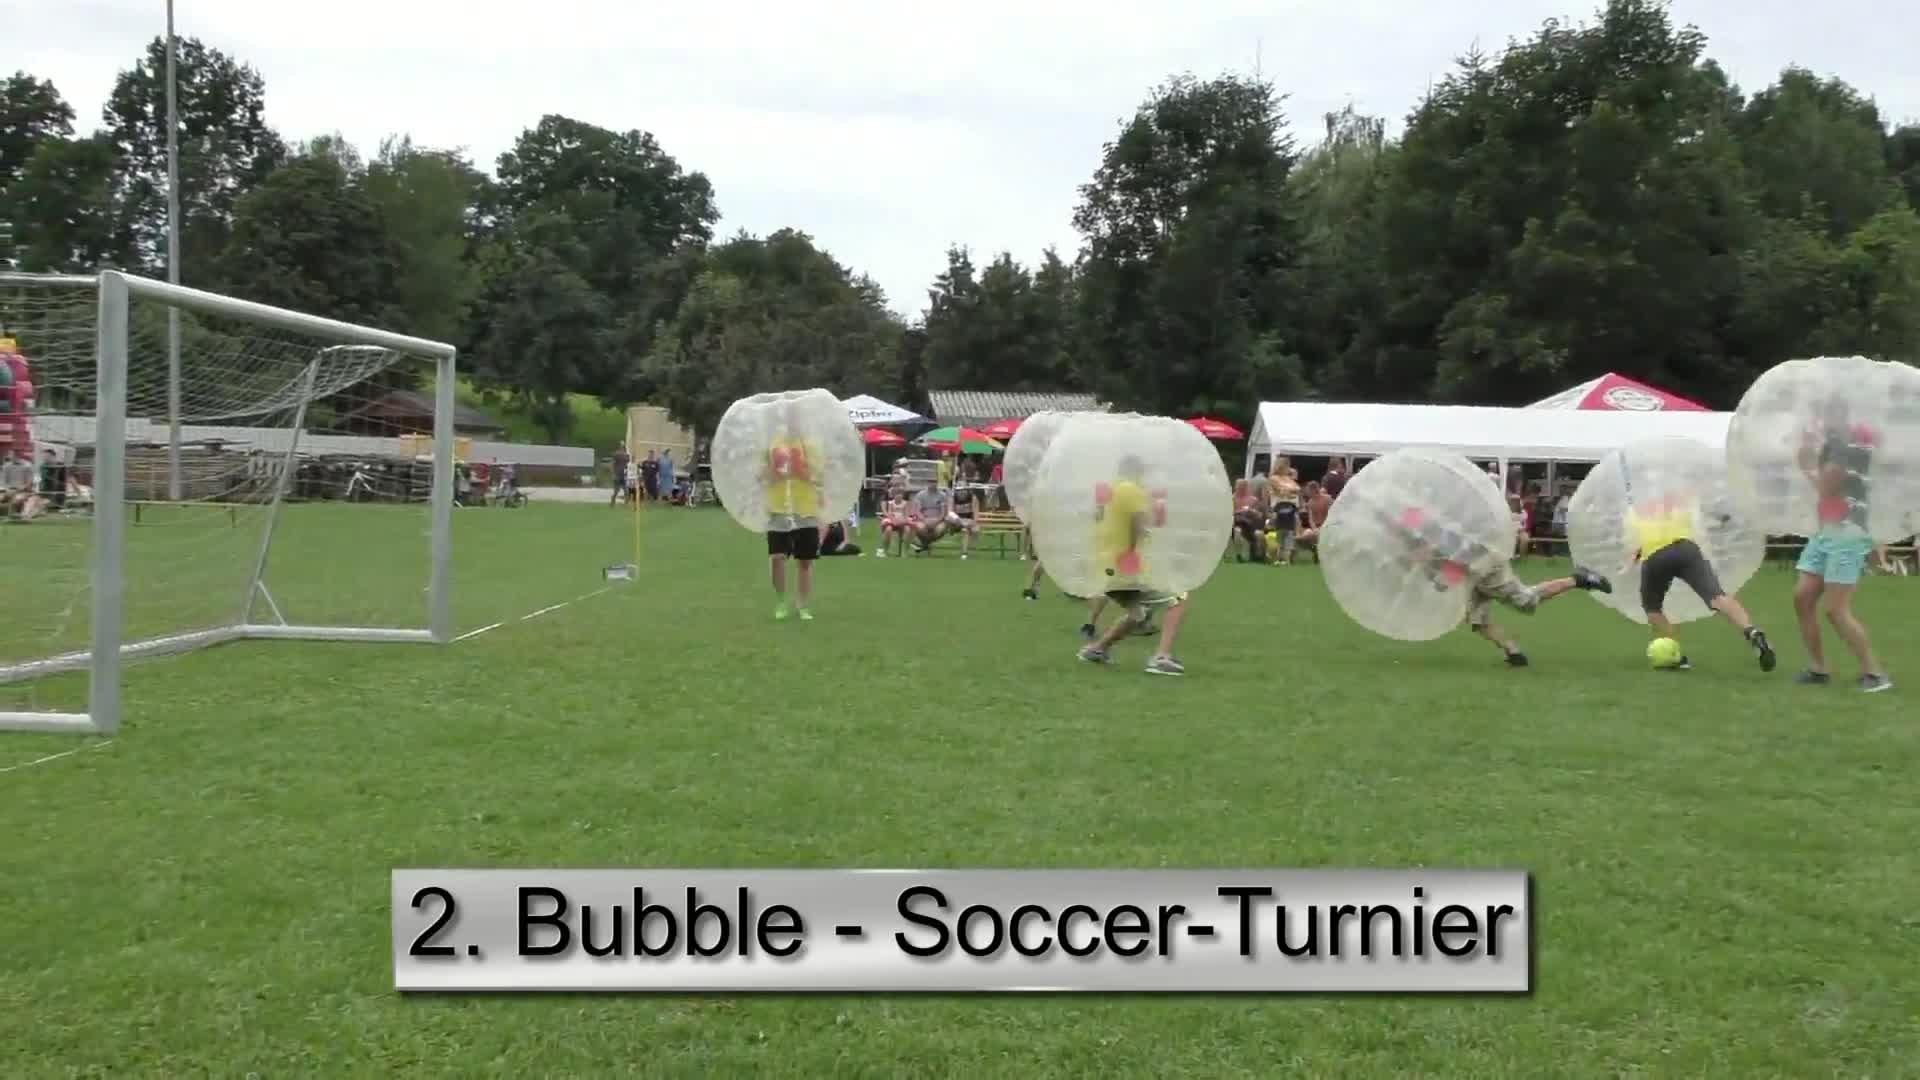 2. Bubble-Soccer Turnier